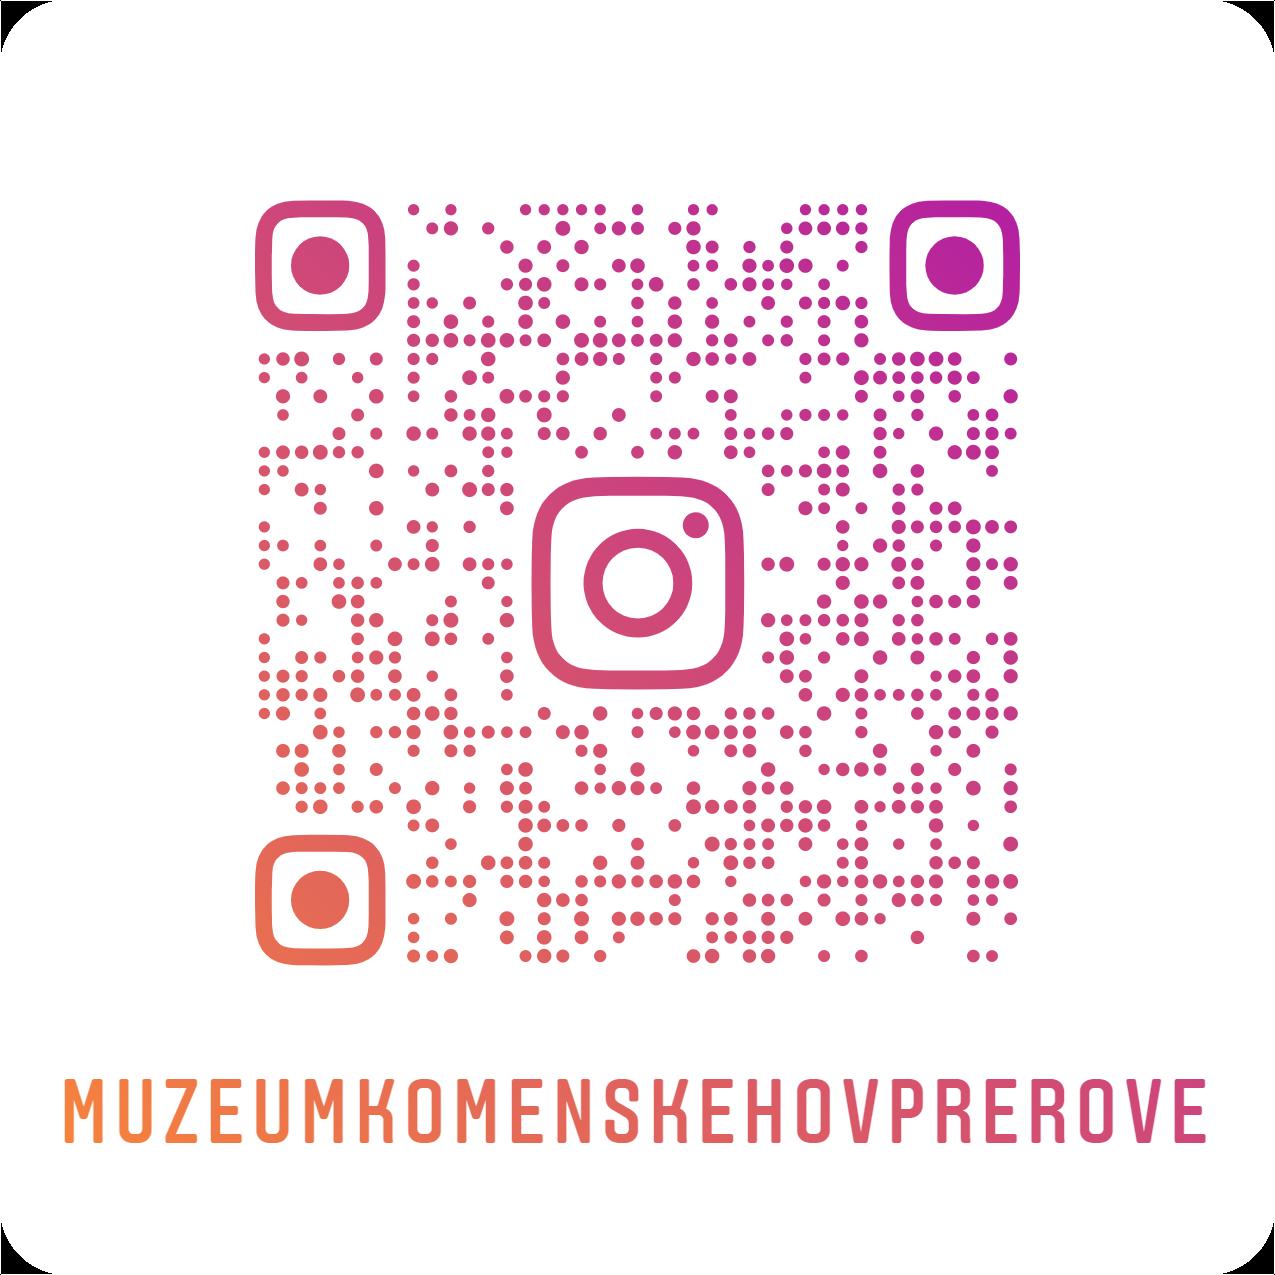 muzeumkomenskehovprerove_nametag (5)